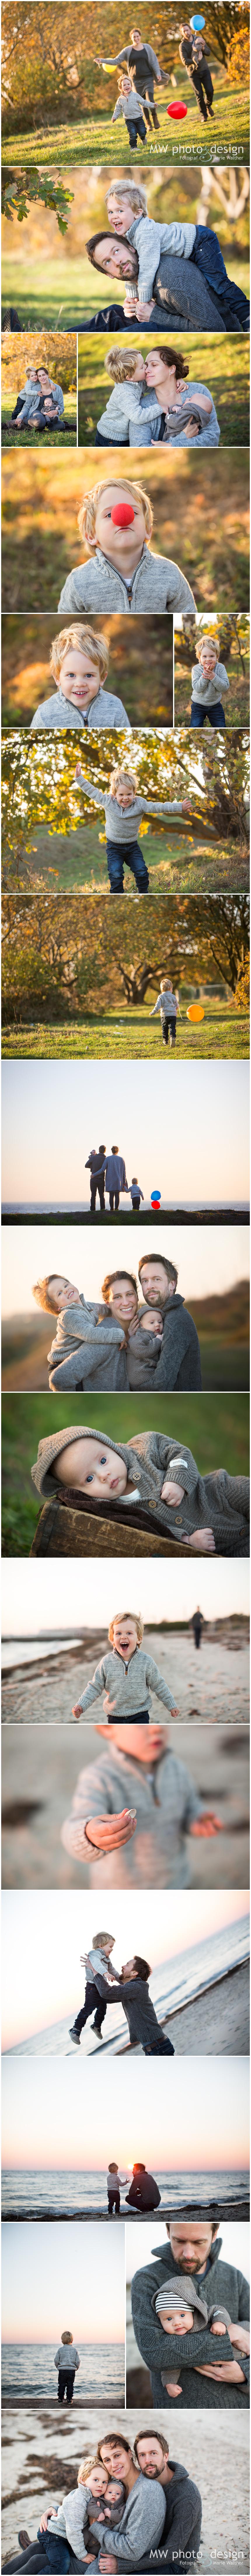 familjefotografering, barnfotograf, familjefotograf, Helsingborg, Ramlösa, mw photo&design